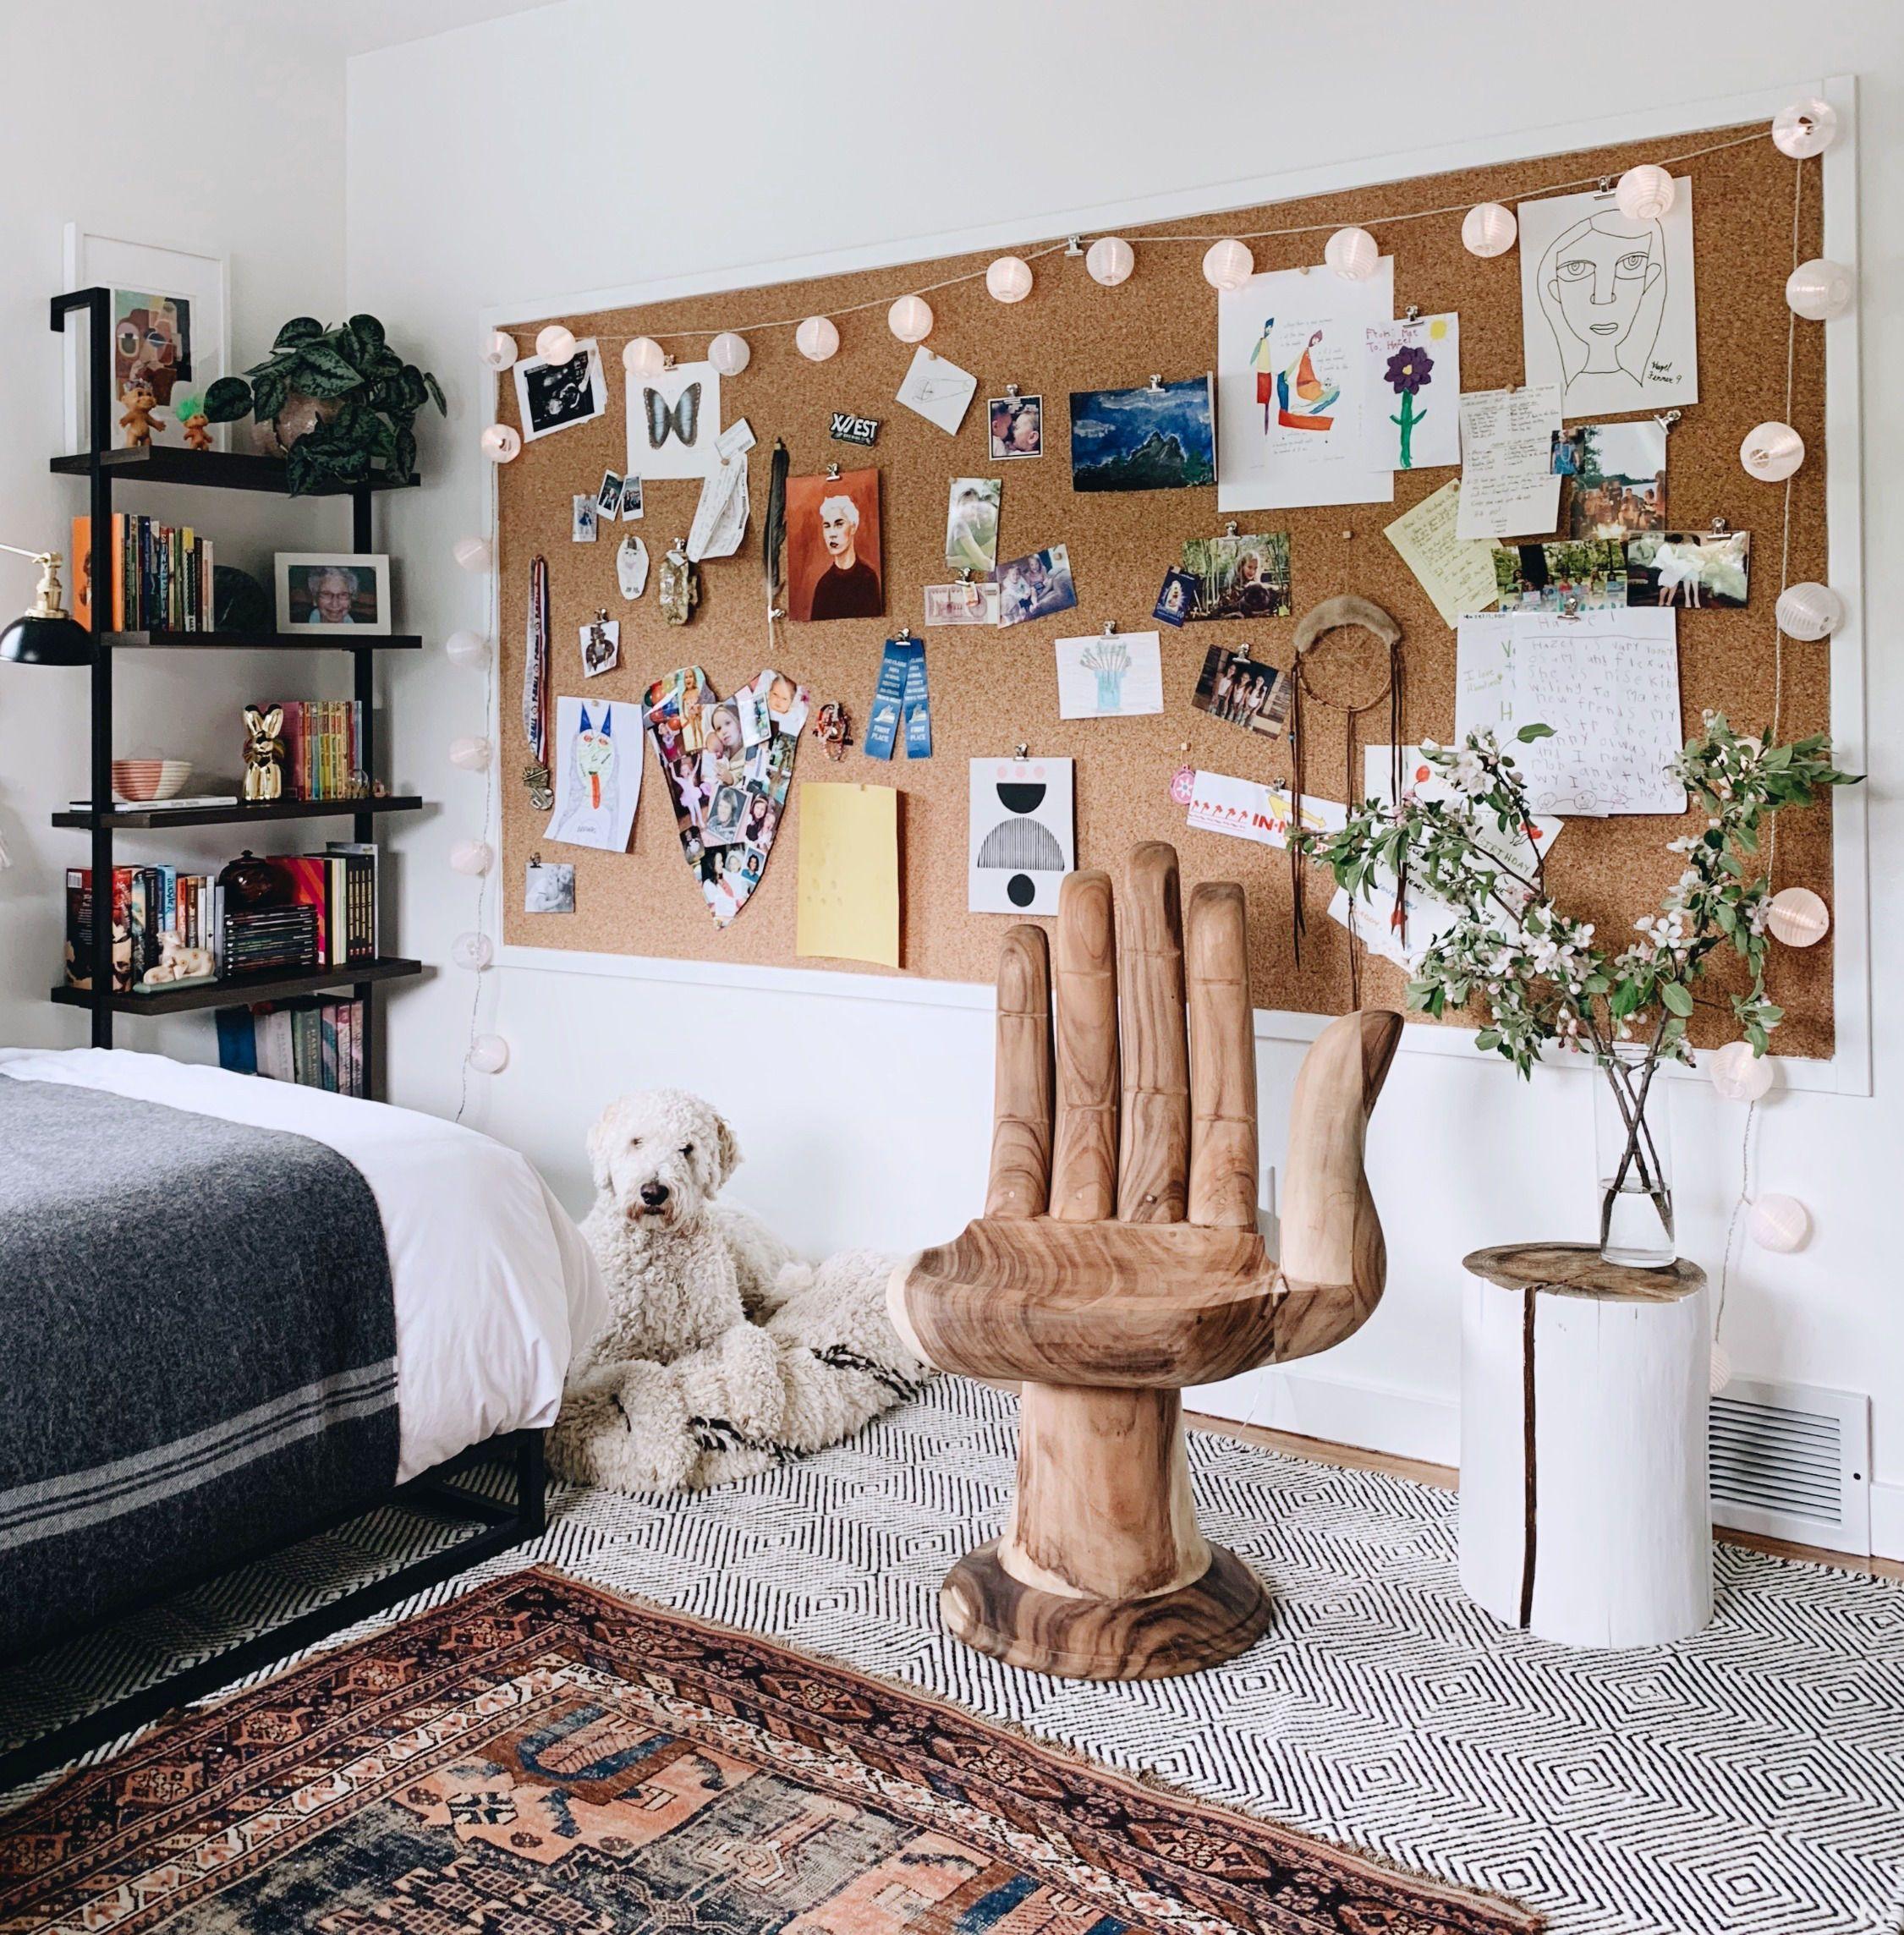 Cork Board Wall Kids Bedroom Bedroom Board Cork Kids Wall In 2020 Cork Board Wall Cork Board Ideas For Bedroom Wall Decor Bedroom